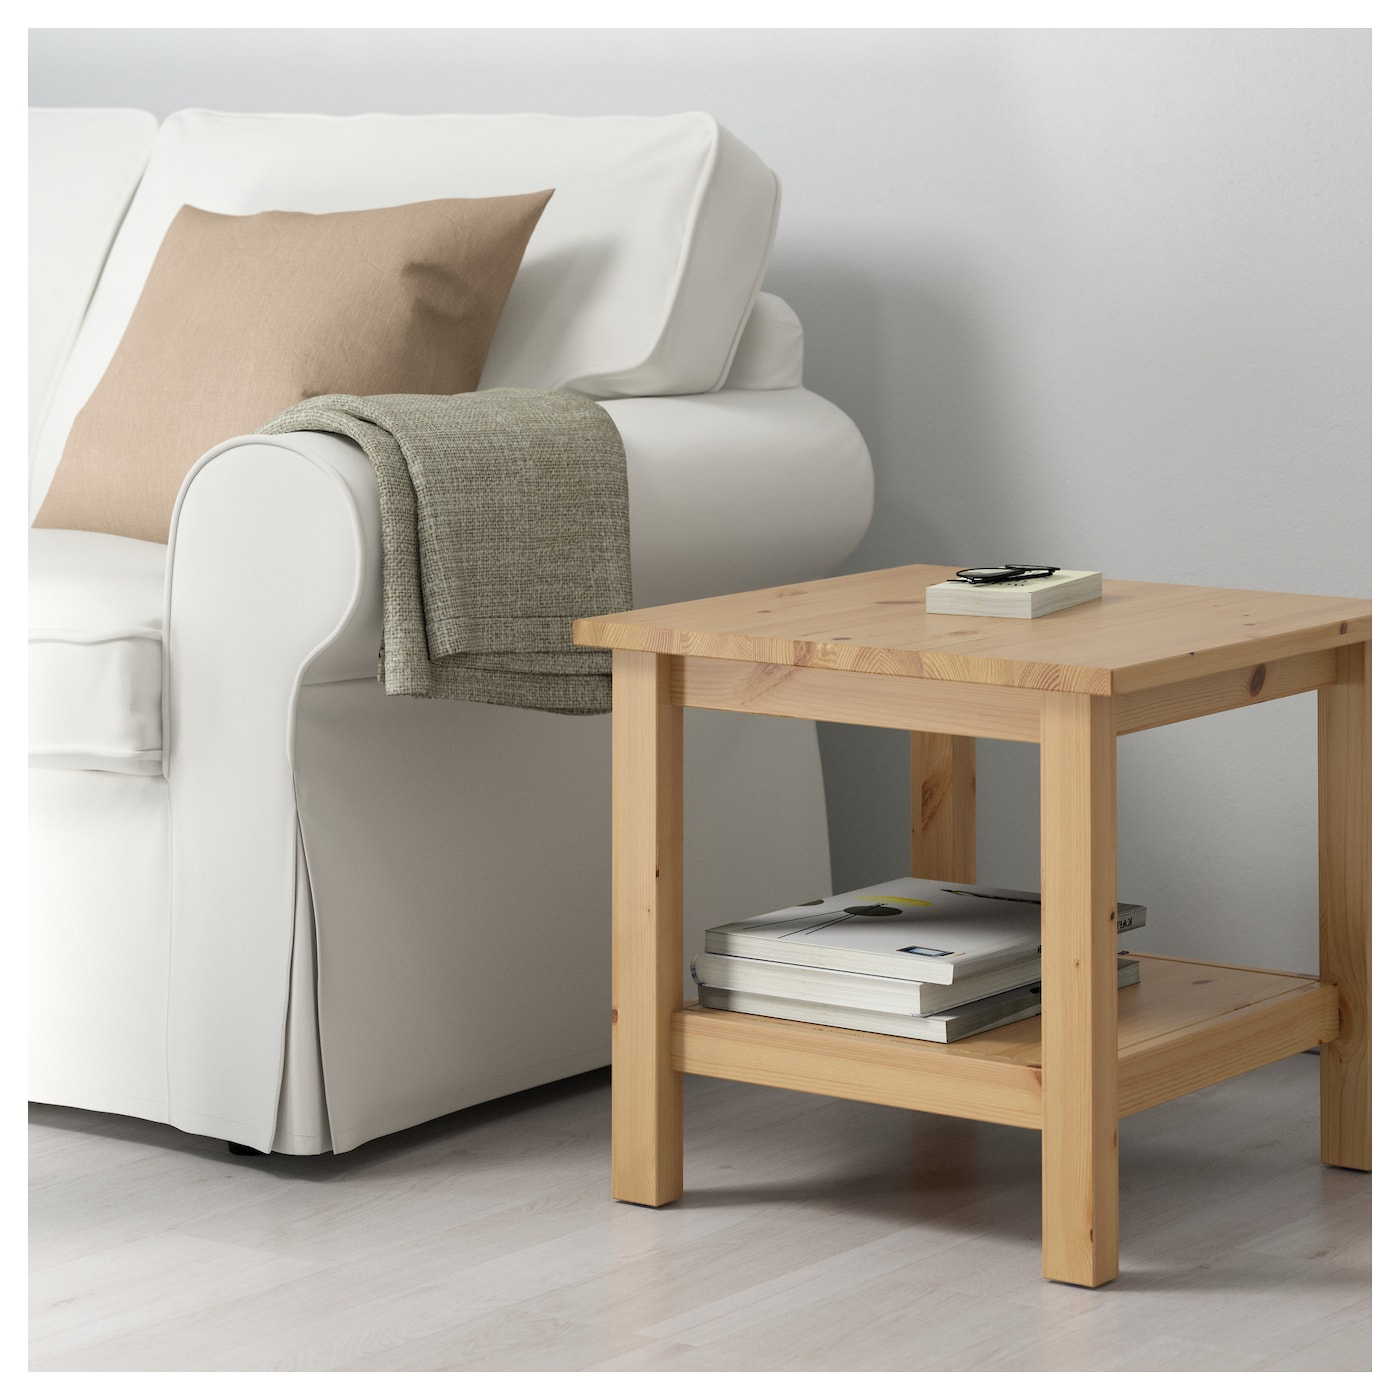 HEMNES Side Table Light Brown 55x55 Cm